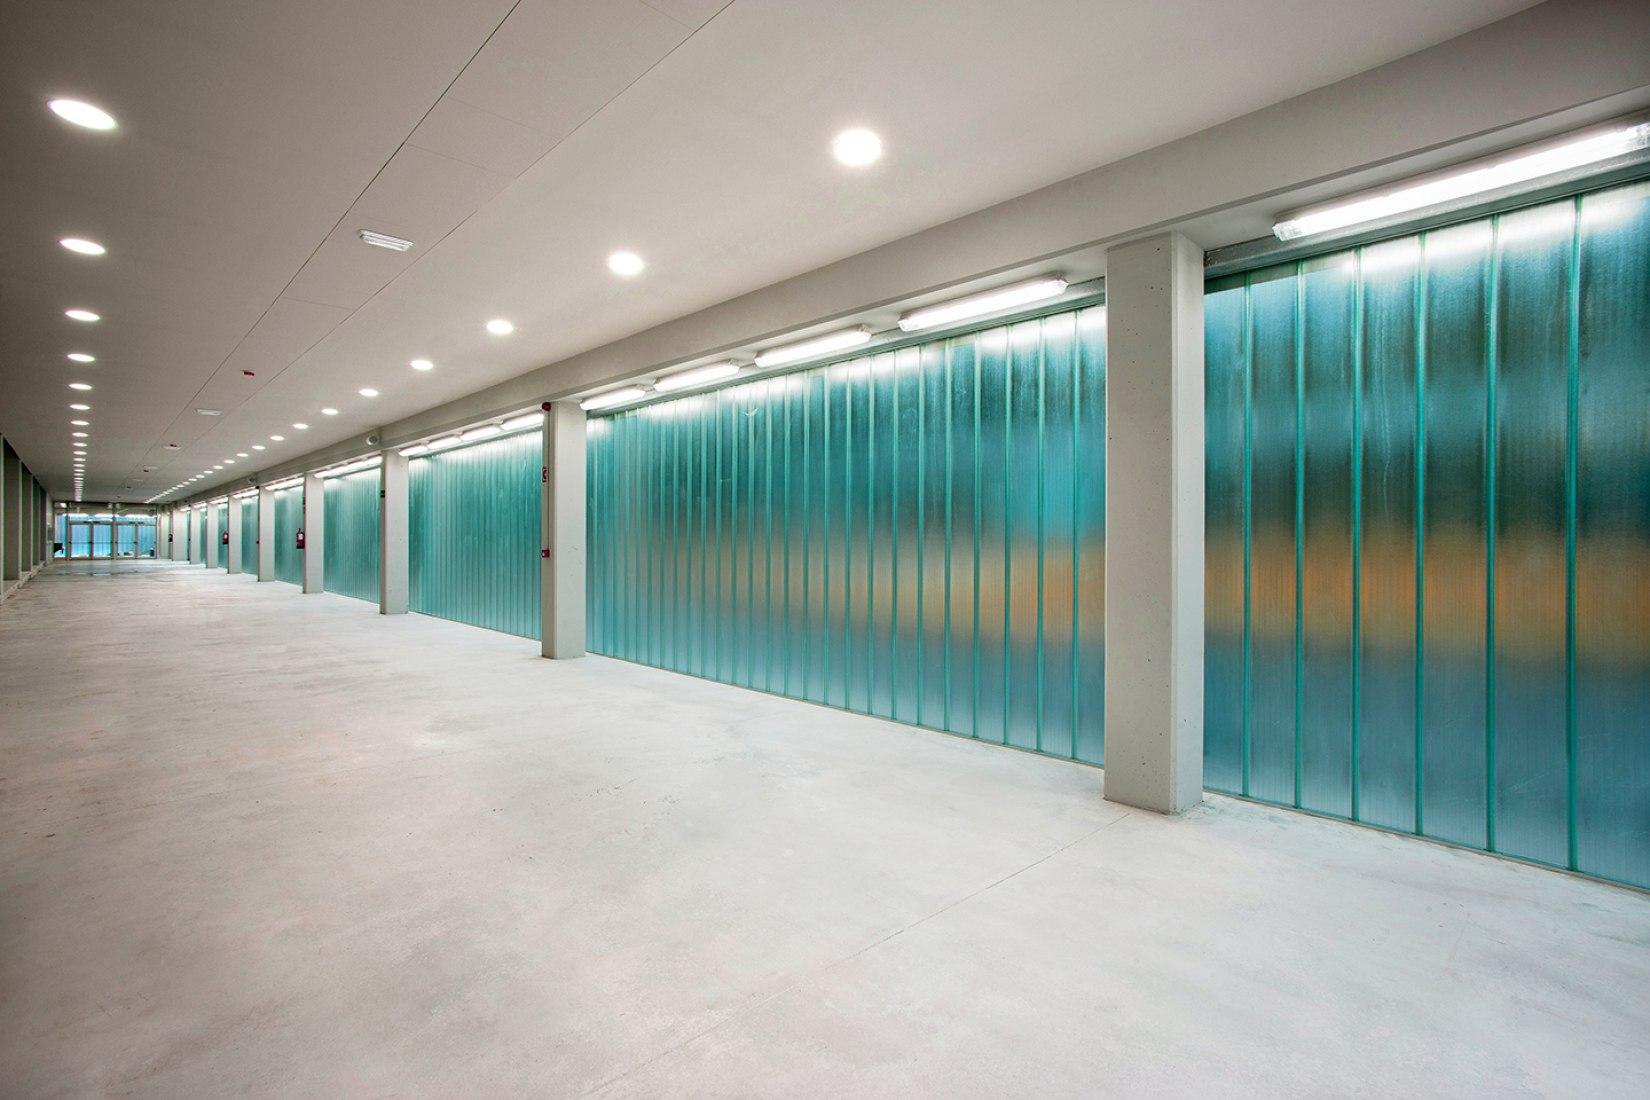 Inside view of Sport Cter. by HIKA arkitektura. Photograph © Agustín Sagasti. Image courtesy of HIKA arkitektura